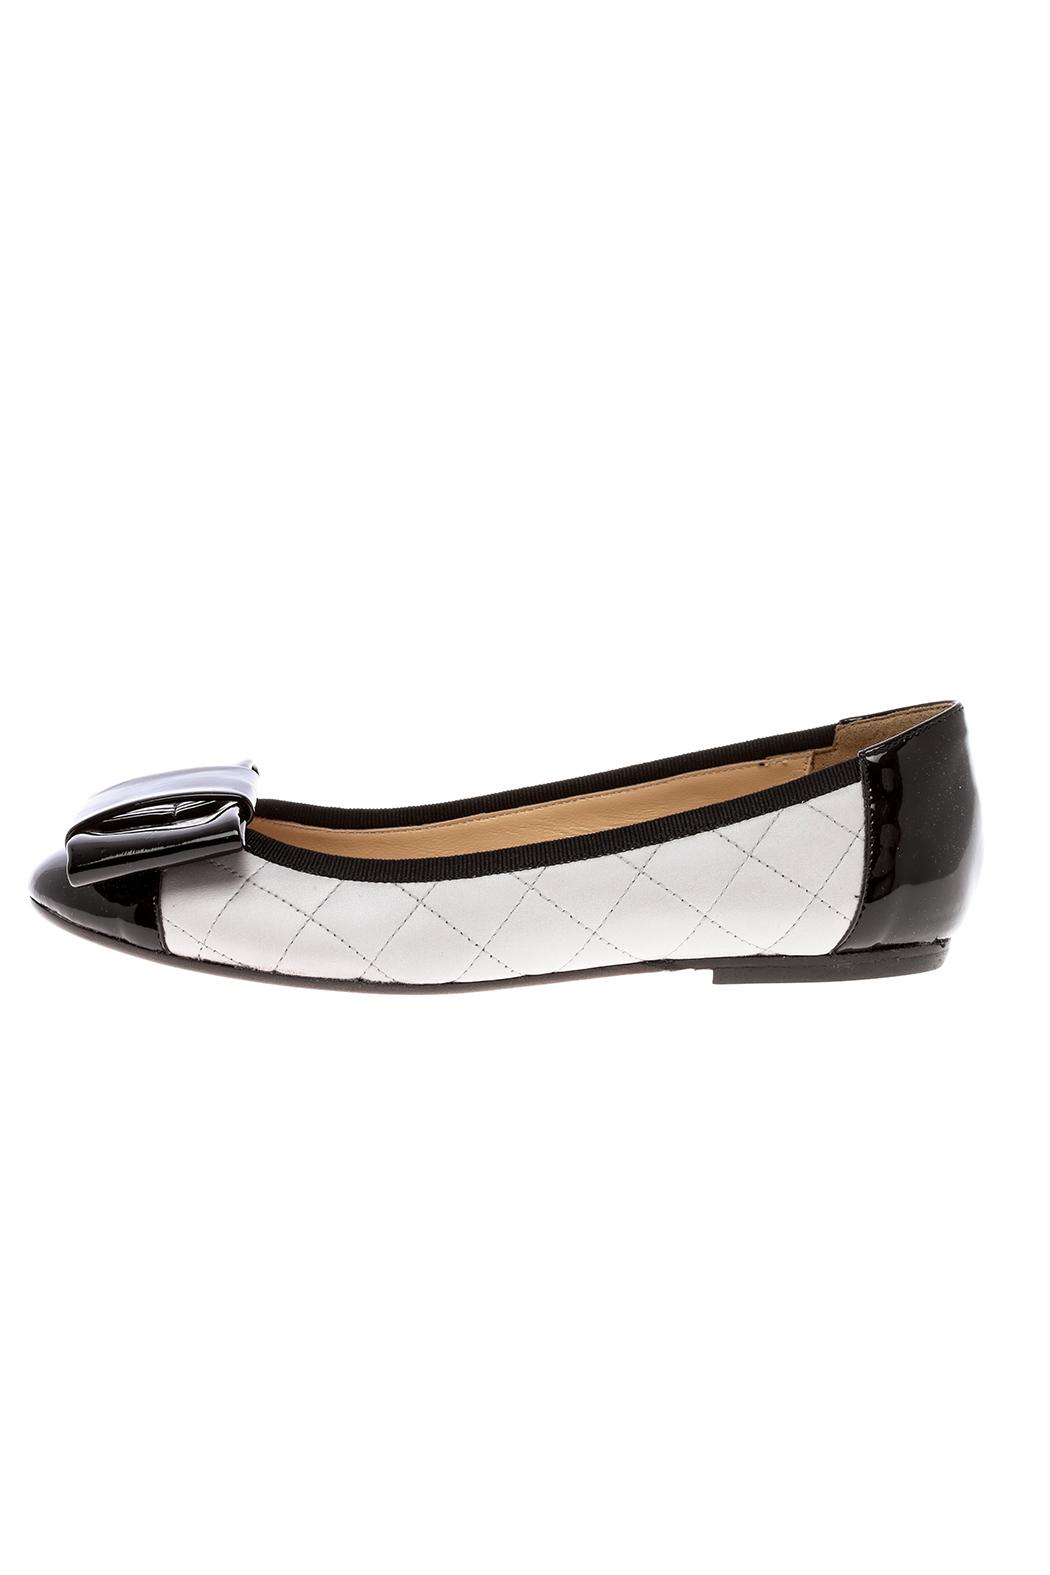 lezu-bellbow-lezu-shoes-ab411d96_l.jpg